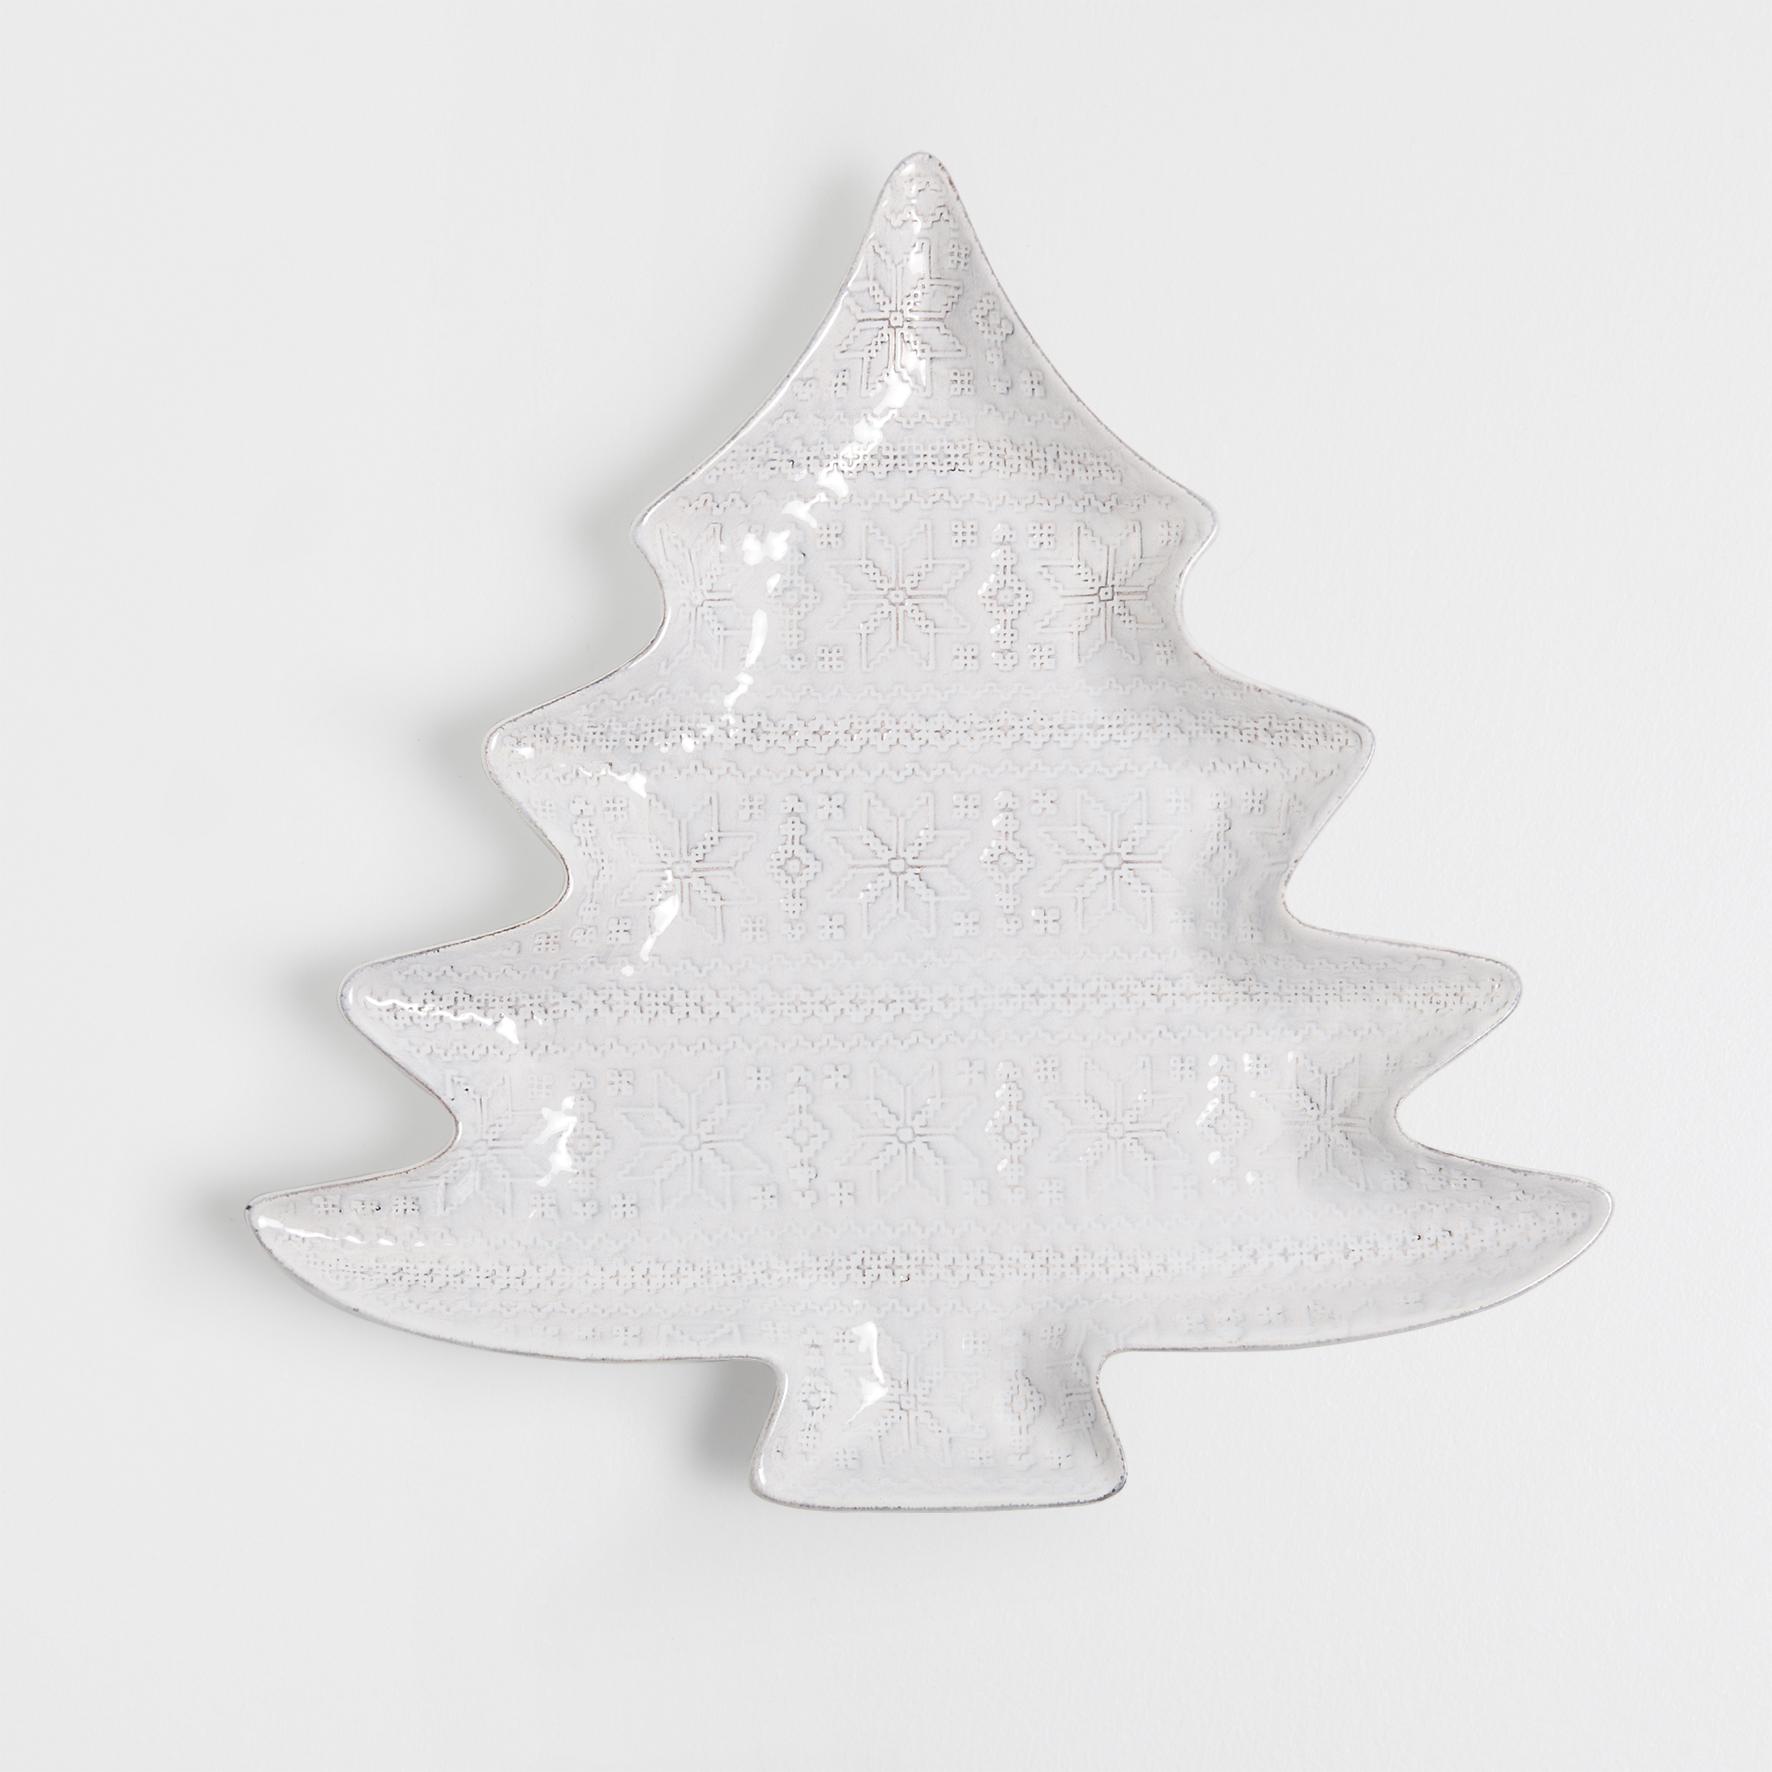 Regali di Natale per la casa, foto